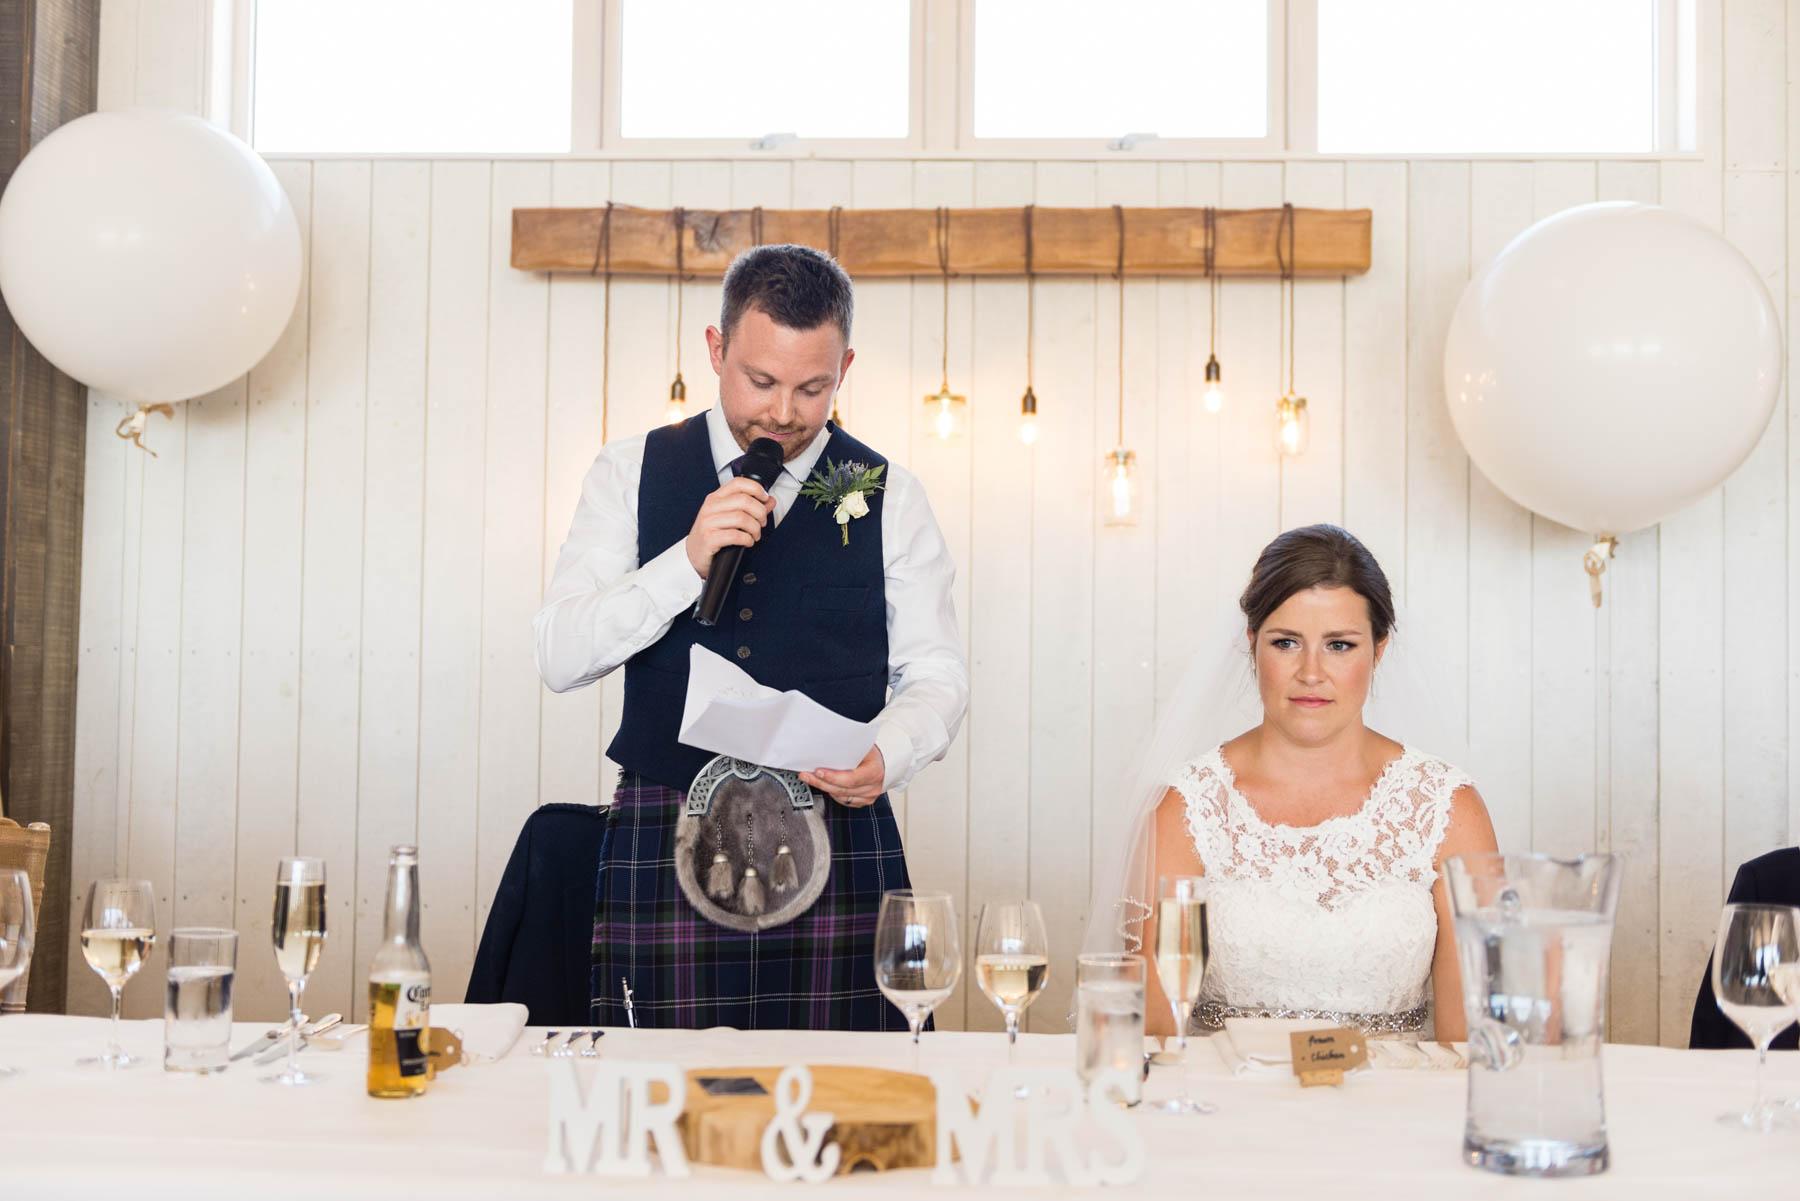 SJThomson_wedding_406.jpg